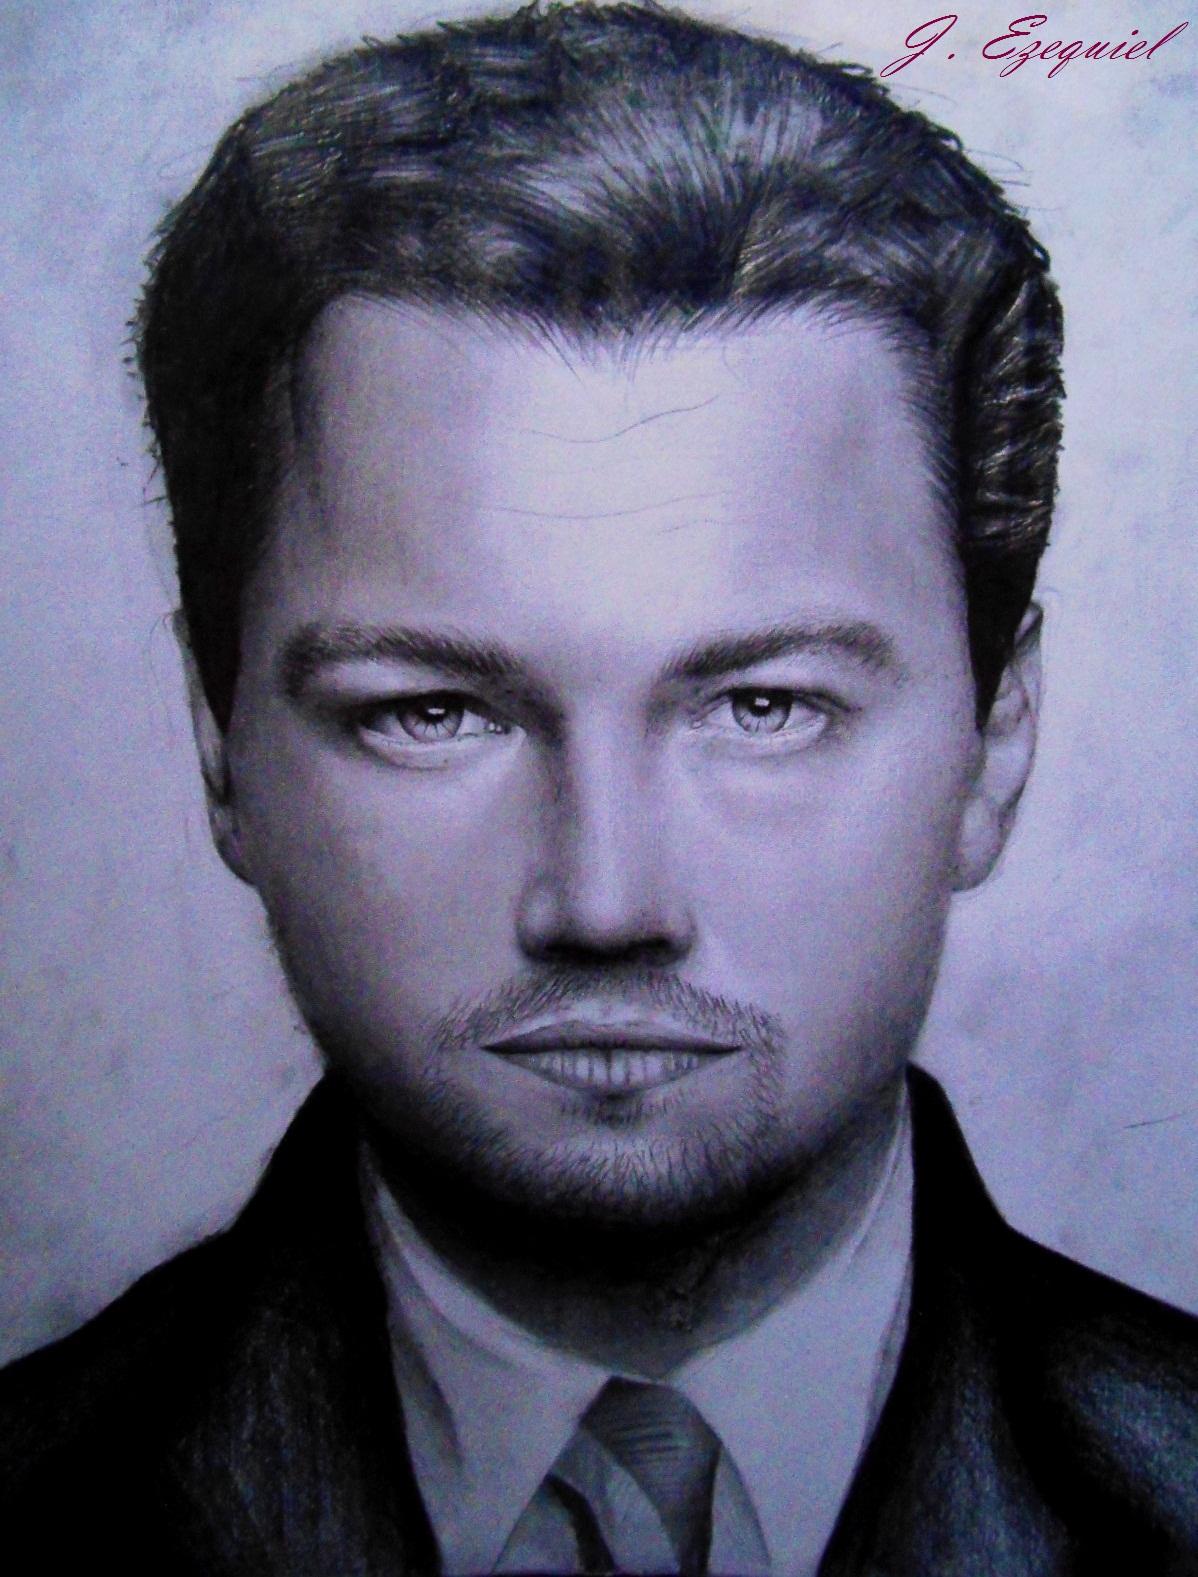 LeonardoDiCaprio (Maybe)